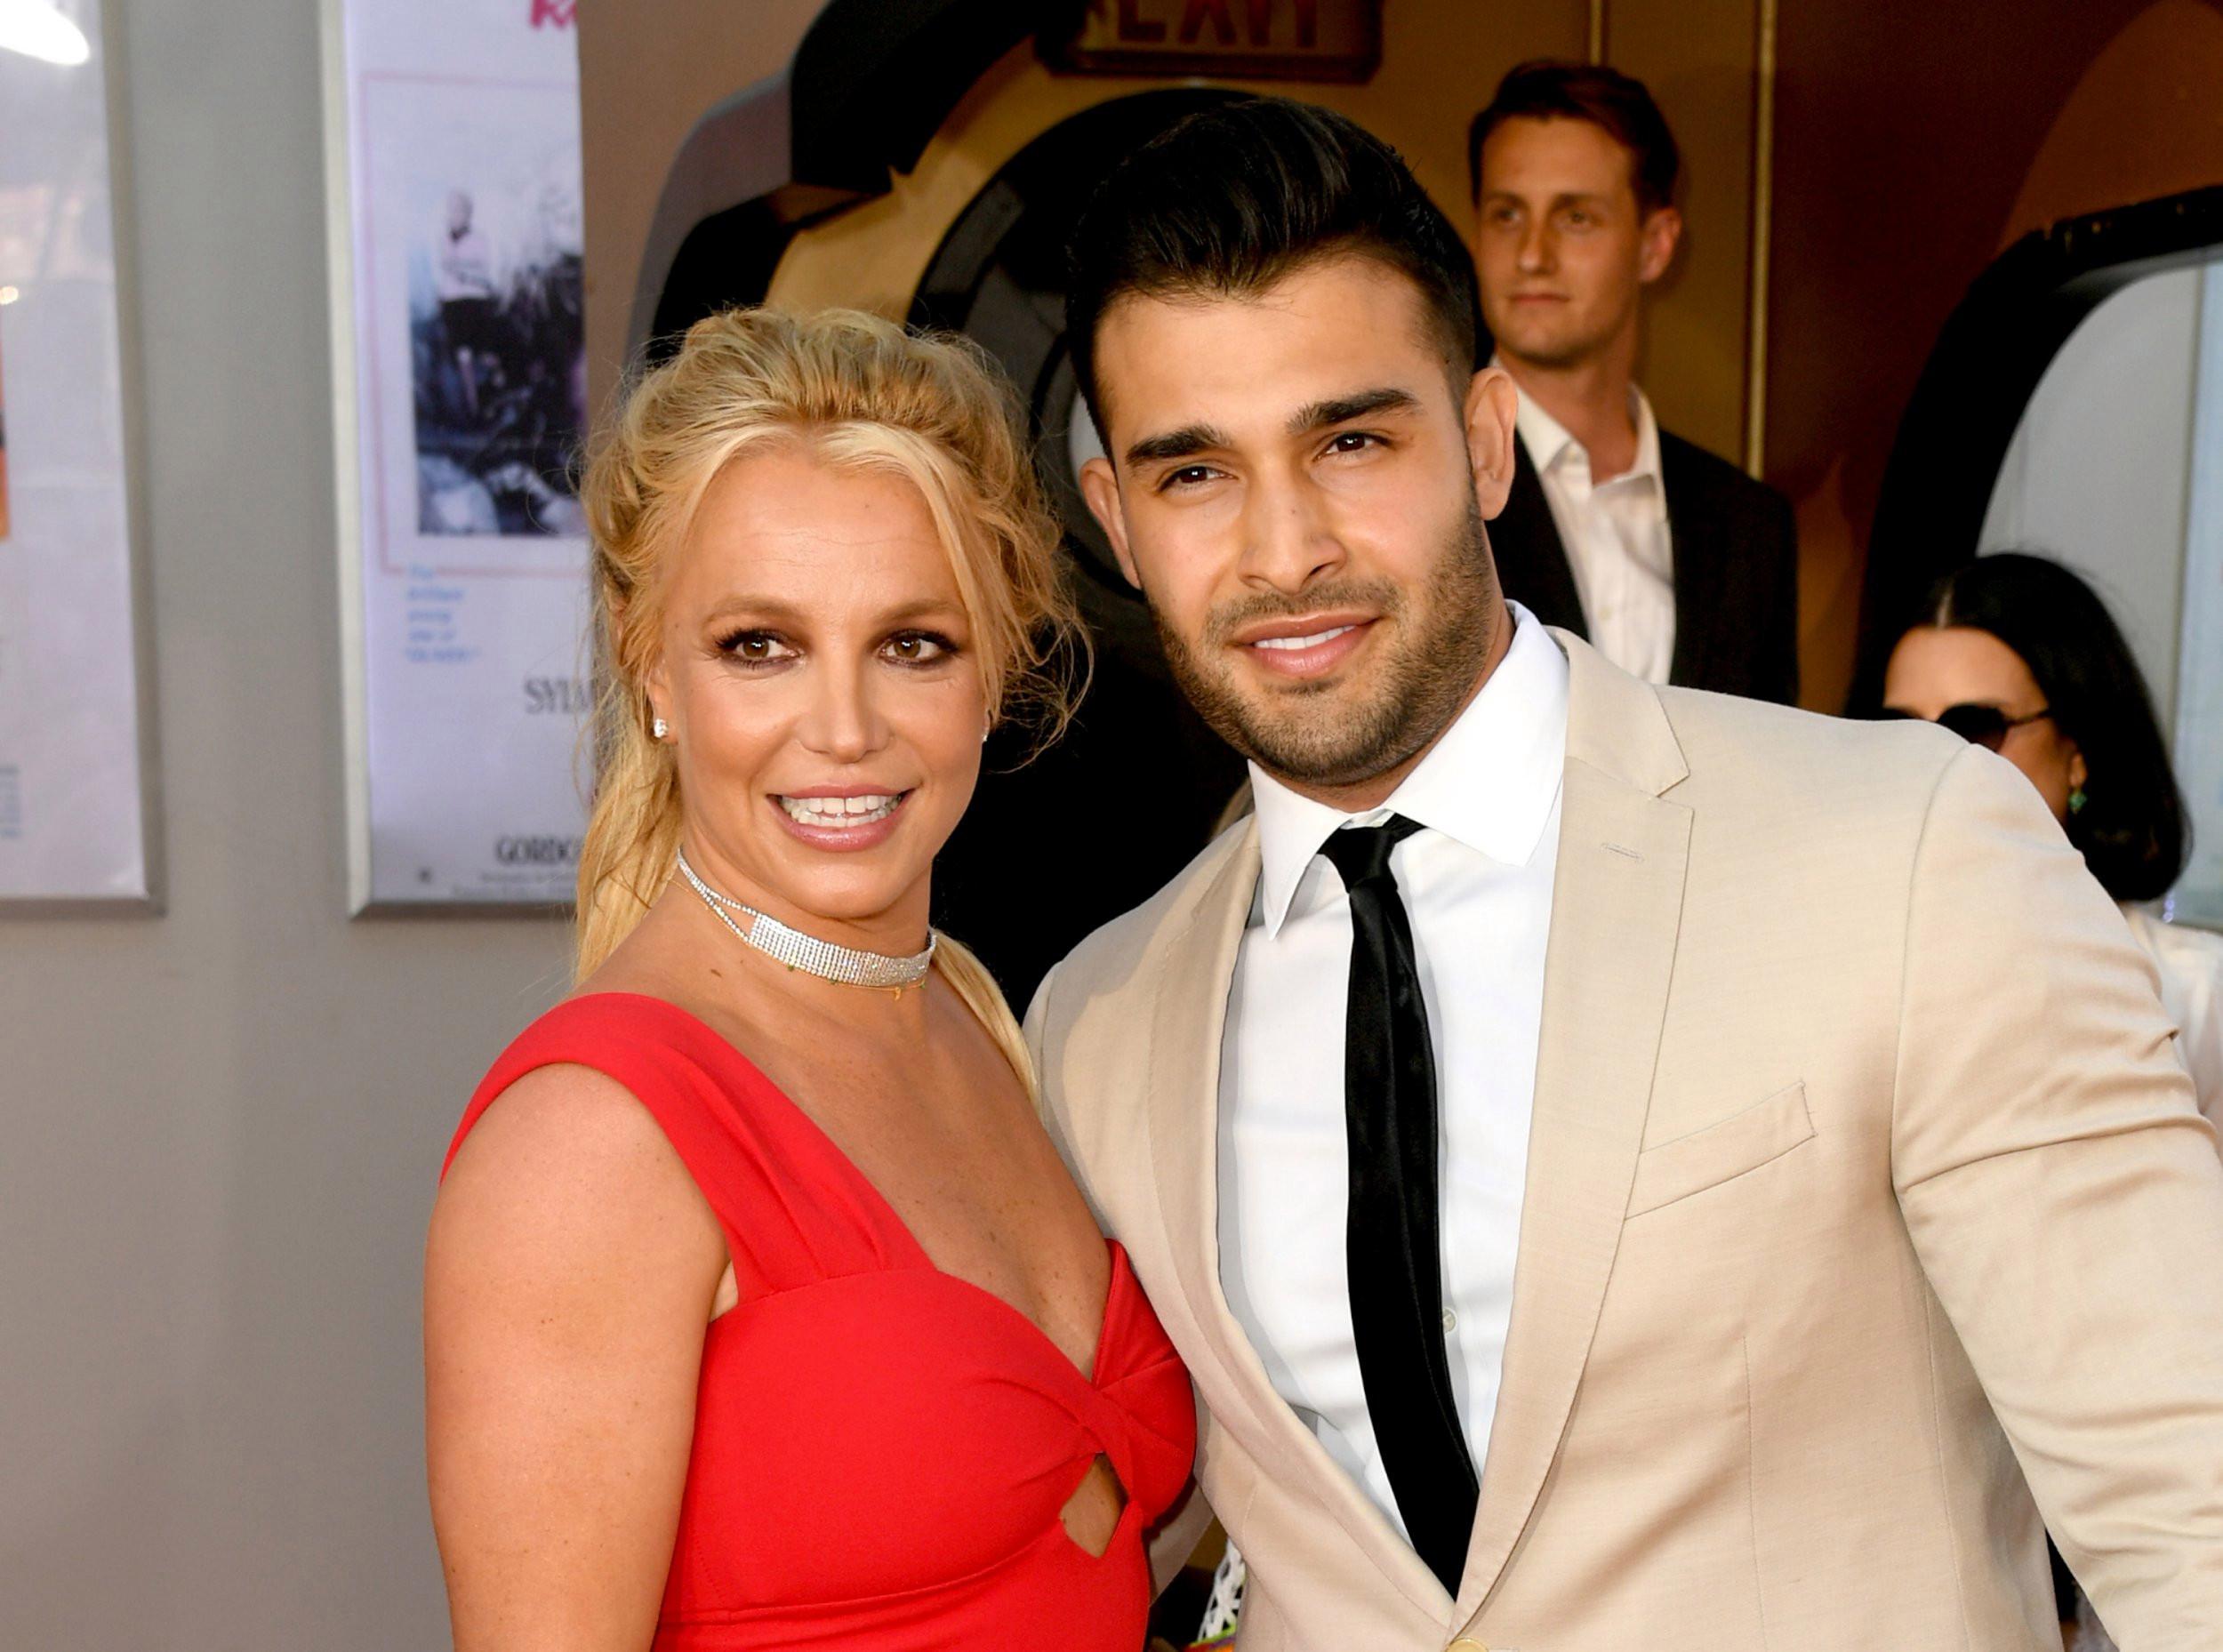 Britney Spears' boyfriend Sam Asghari shares support after court victory amid conservatorship battle